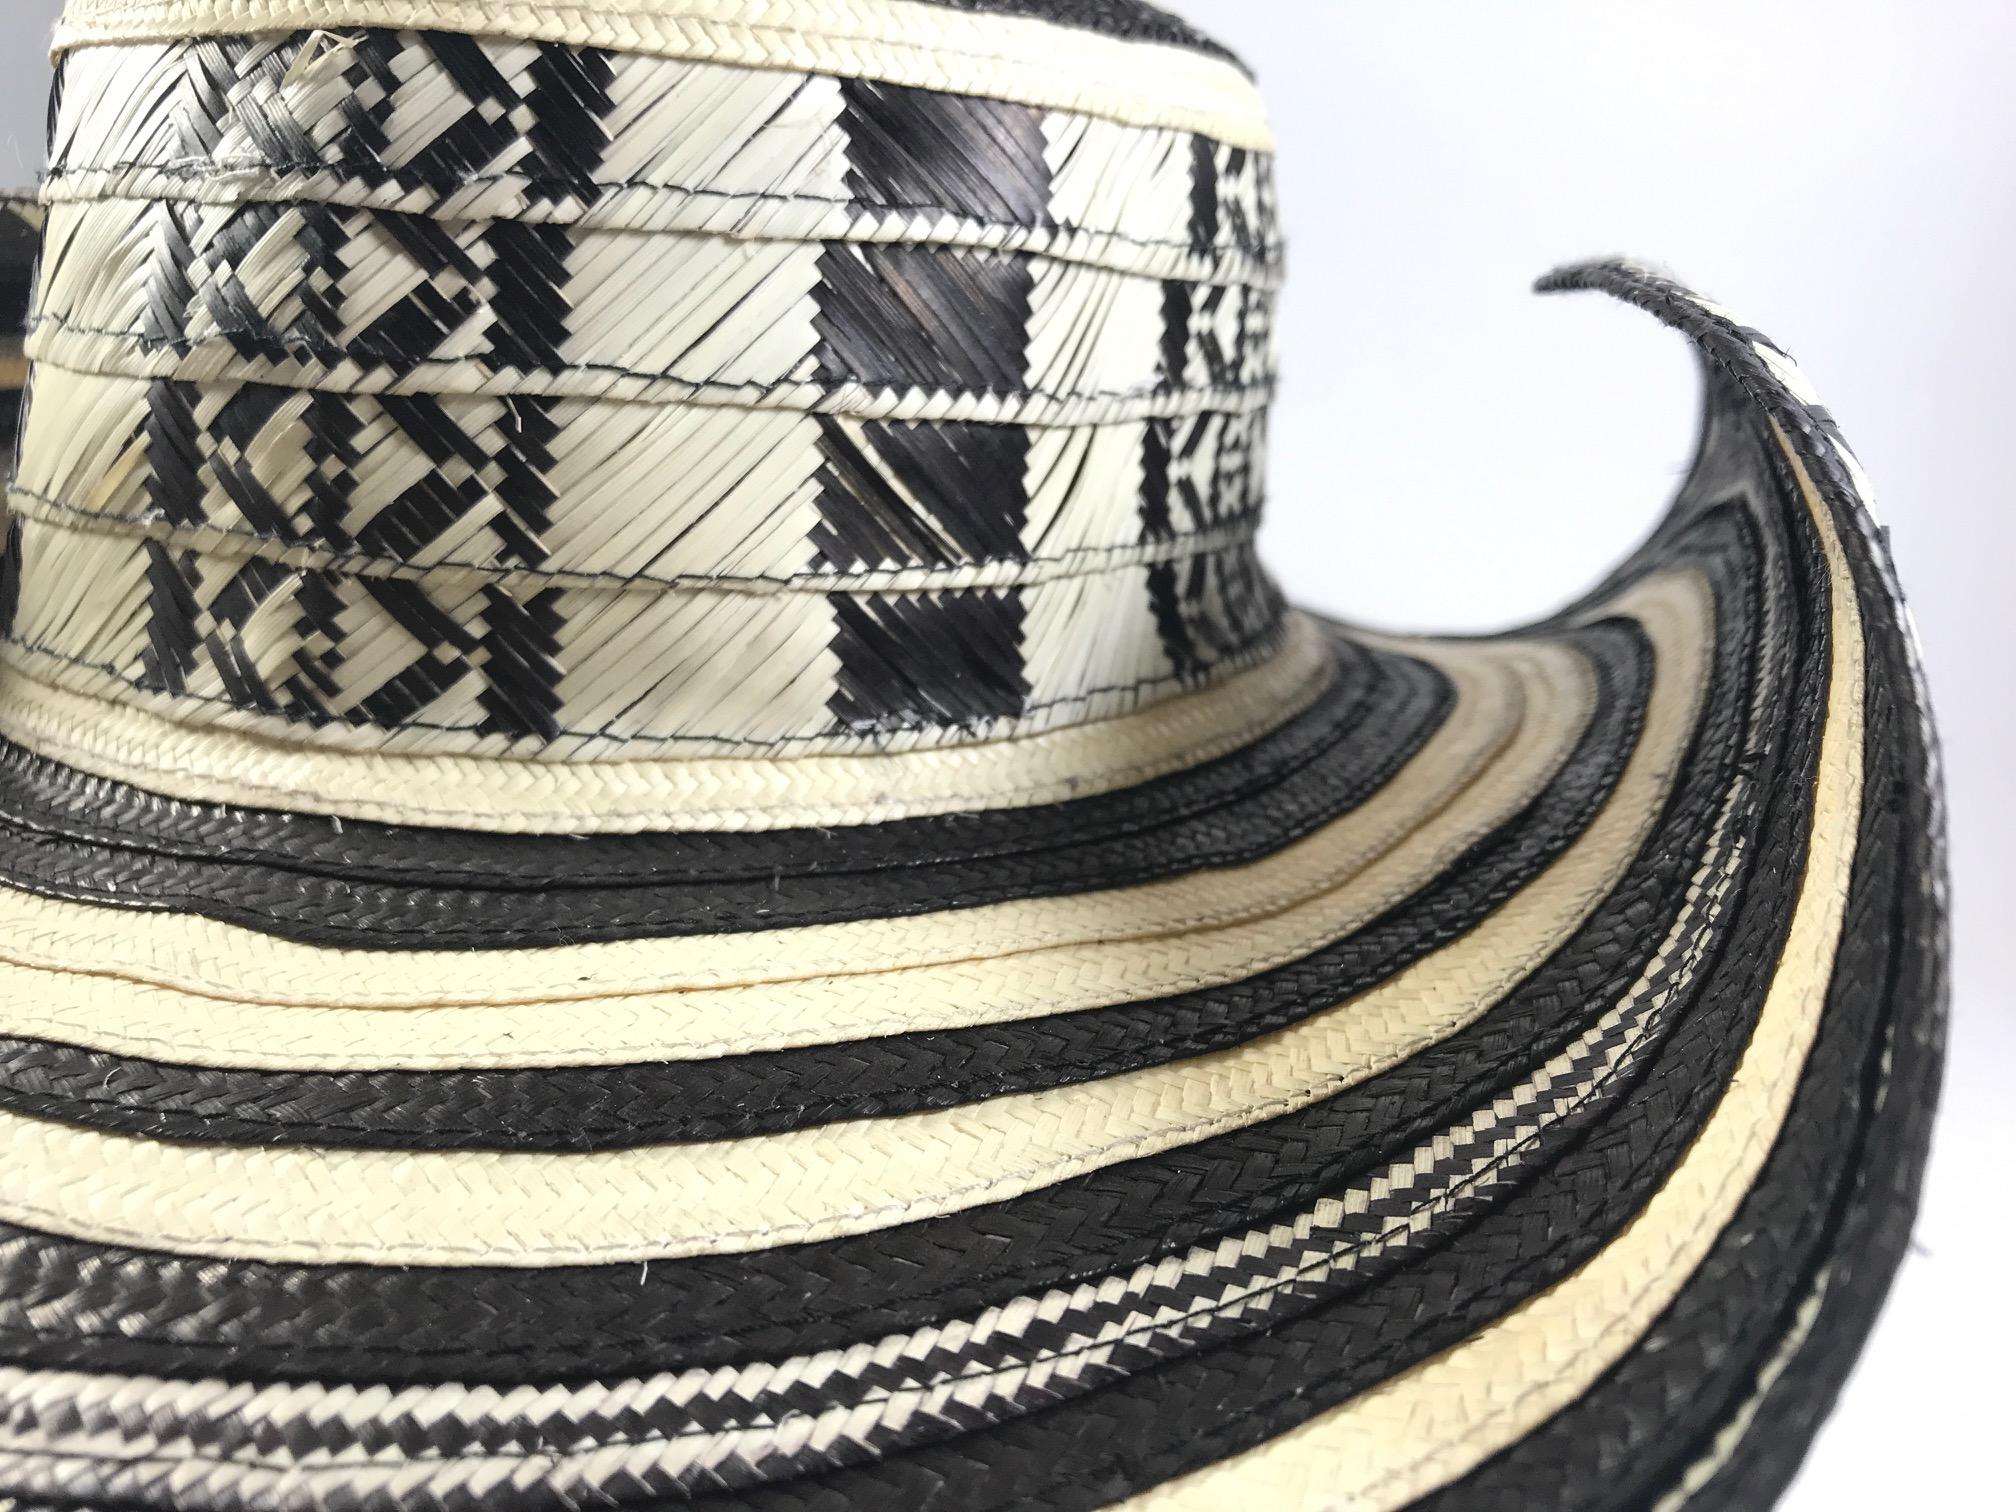 Resultado de imagen para sombrero vueltiao